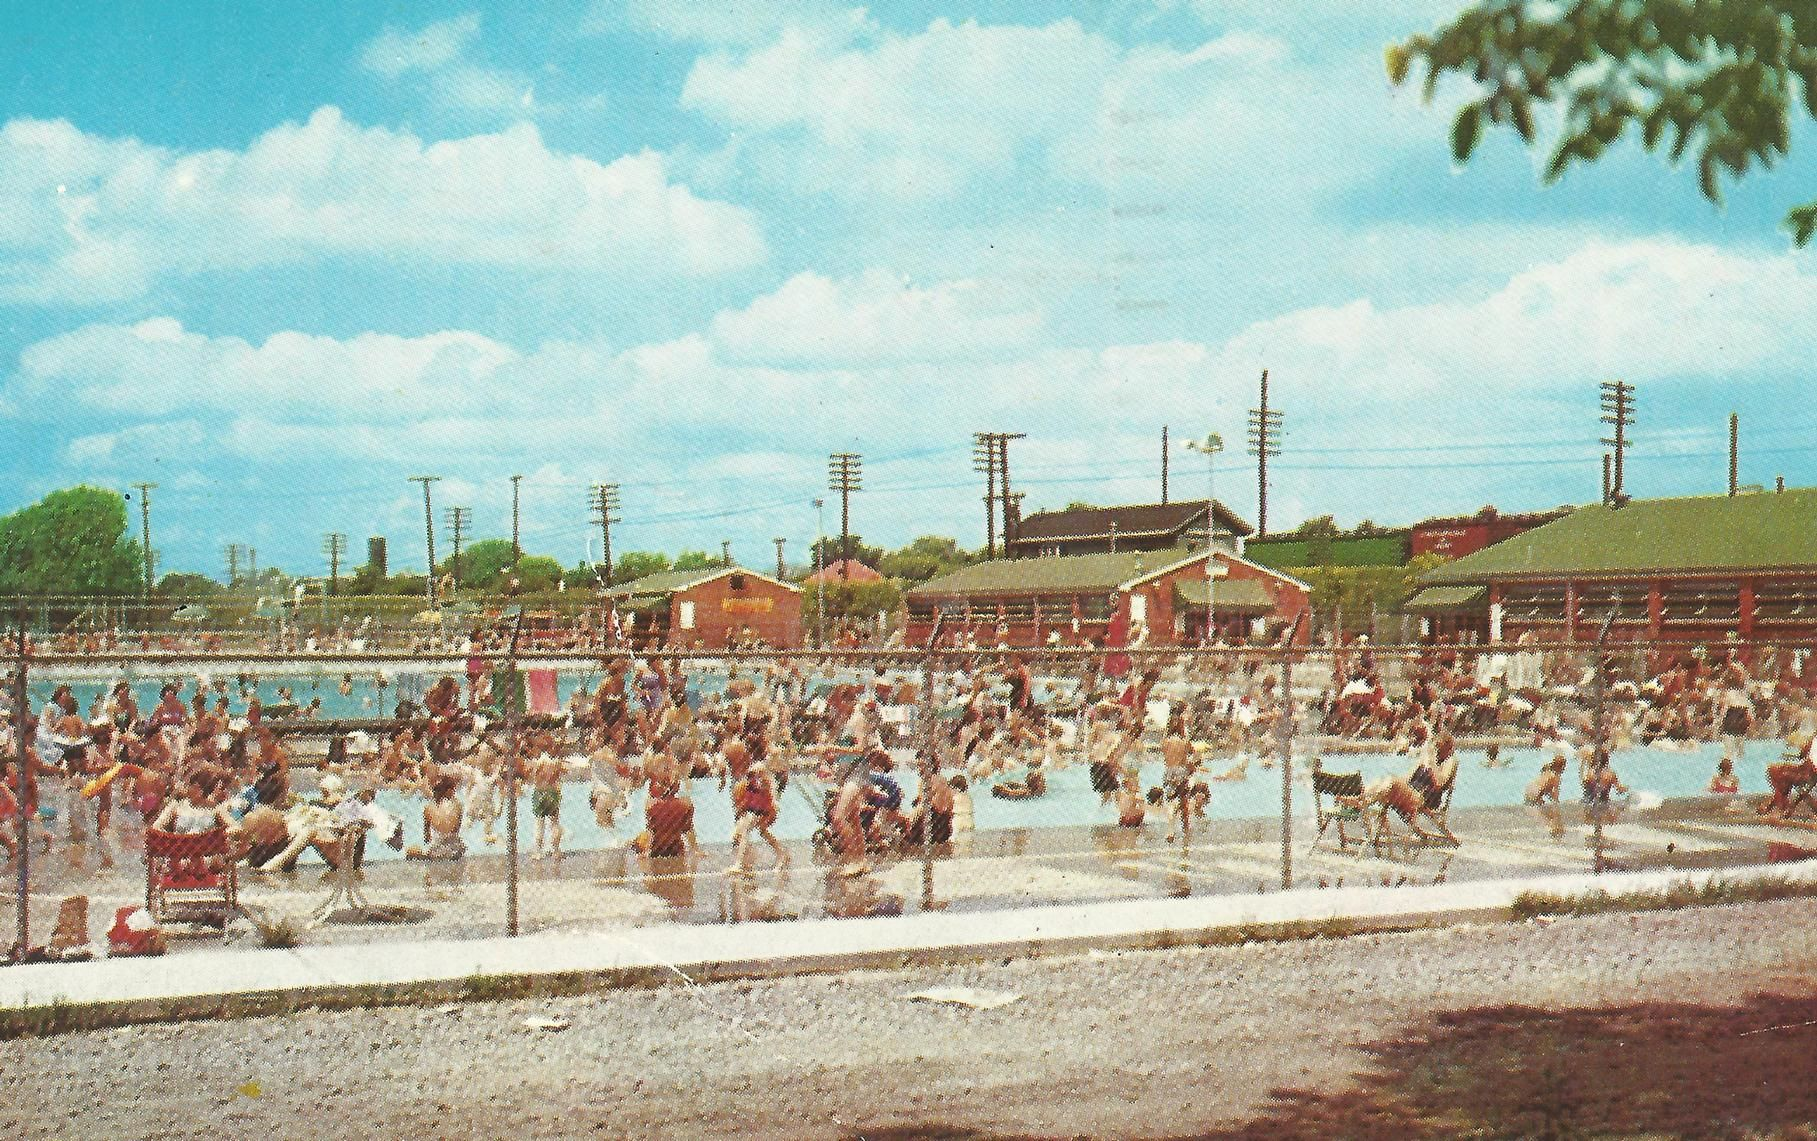 Lost Huntington: The Olympic Pool